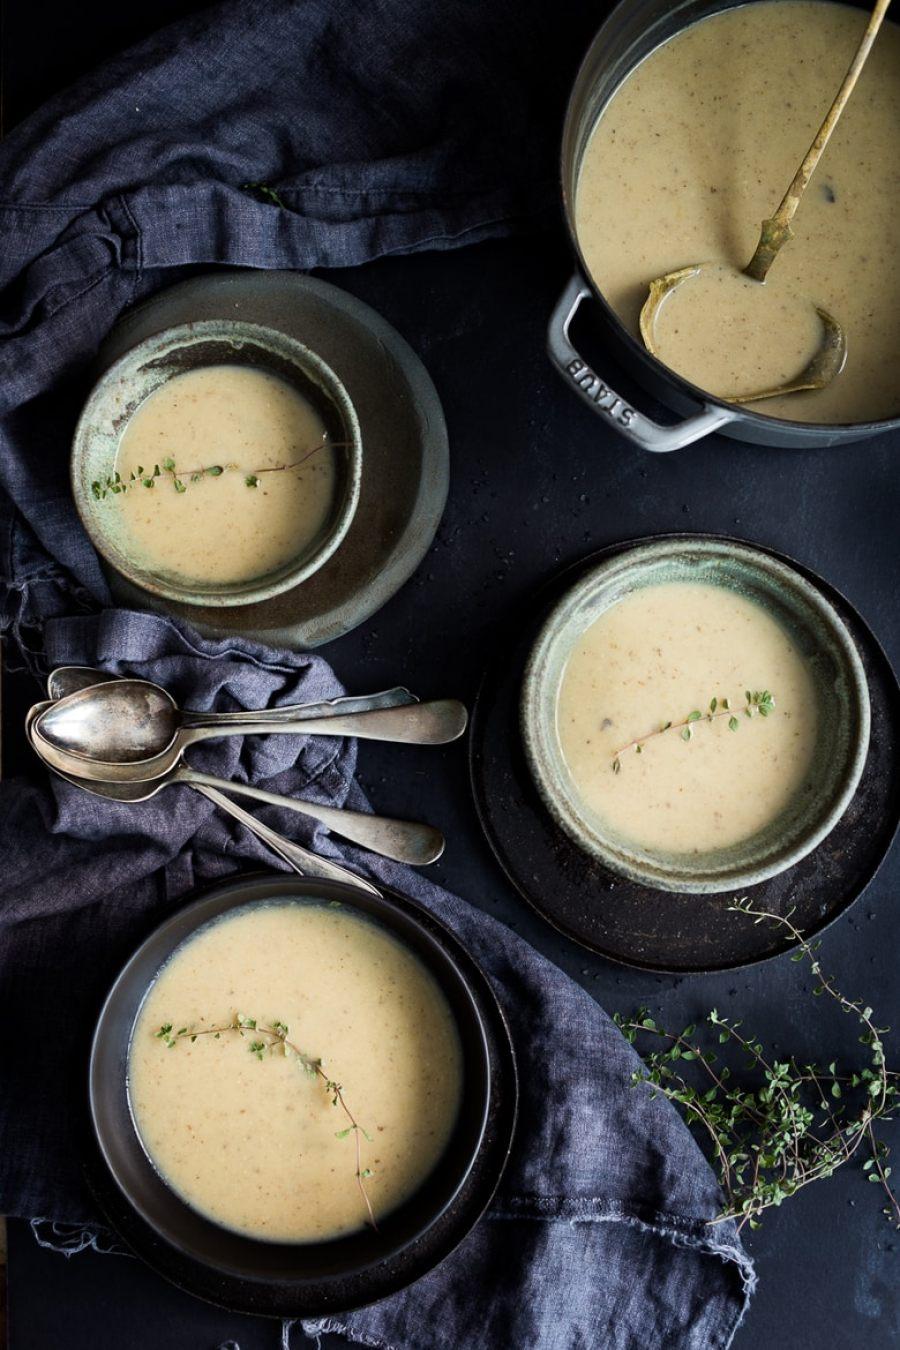 Wild Mushroom & Sunchoke Soup with Truffle oil ...vegan and gluten-free, yet luxurious and decadent.   www.feastingathome.com